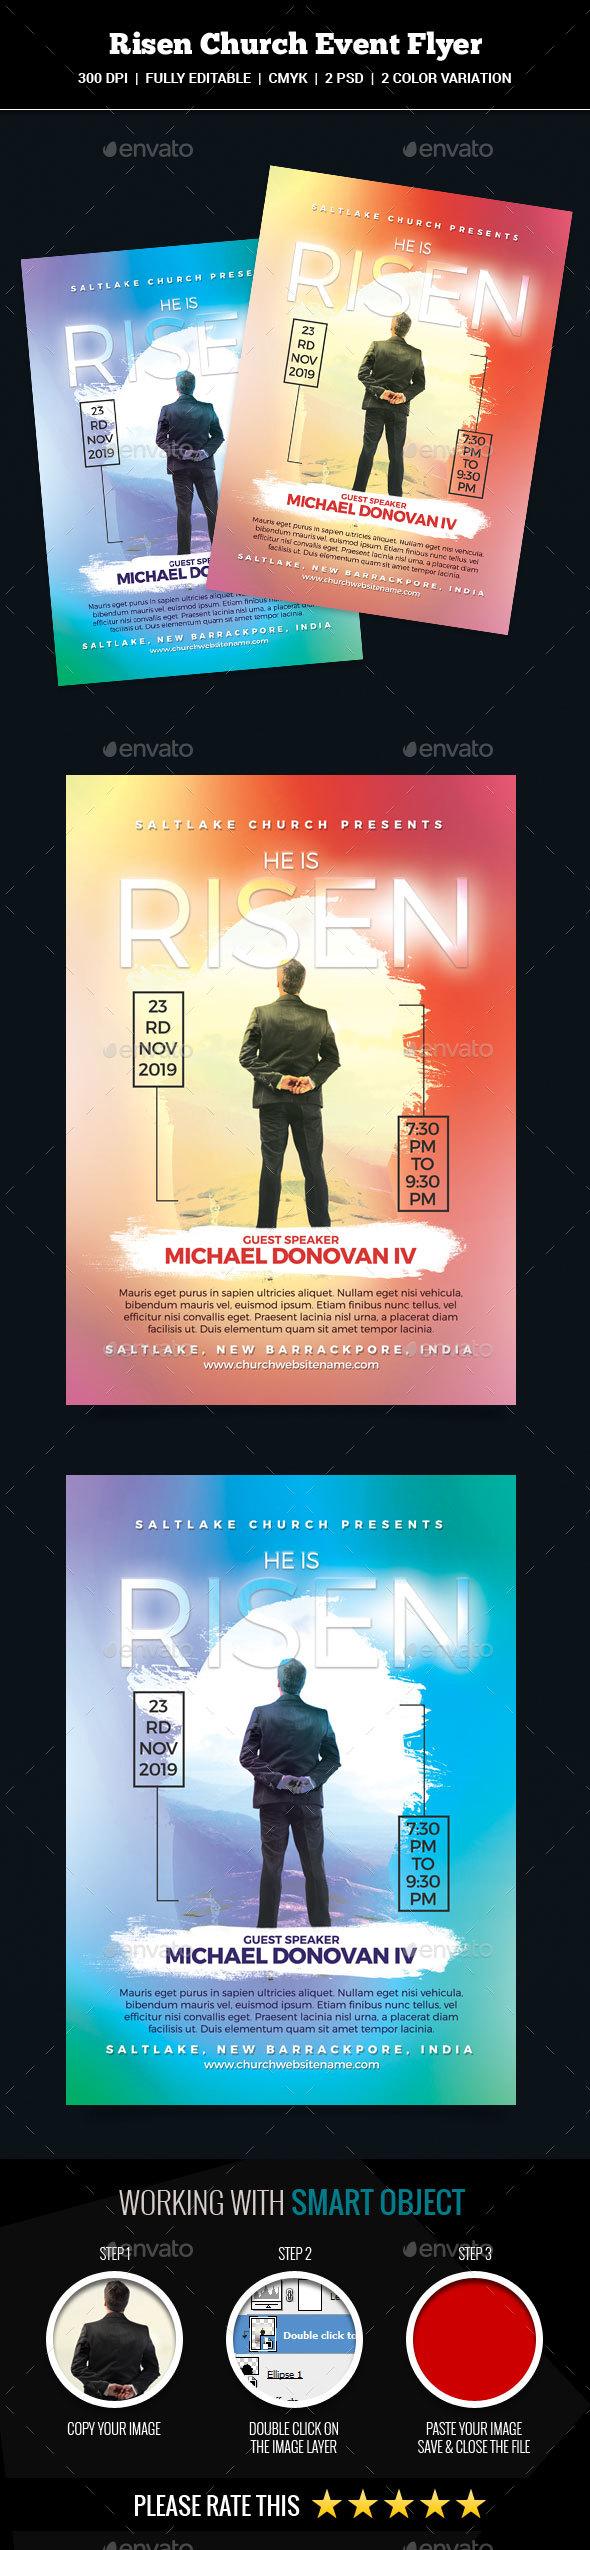 GraphicRiver Risen Church Event Flyer 20838463